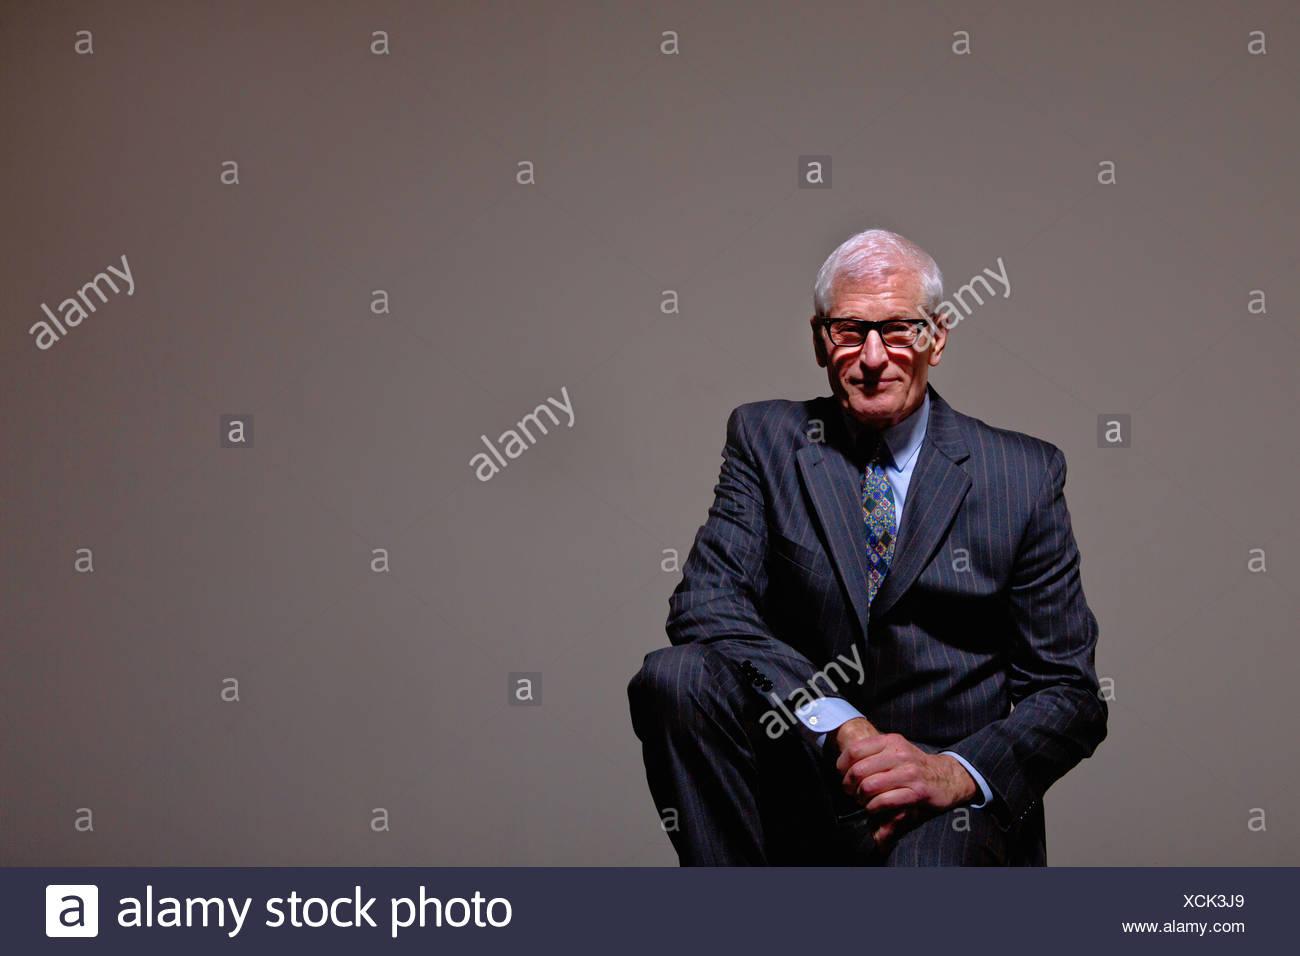 Studio portrait de cool man in suit Photo Stock